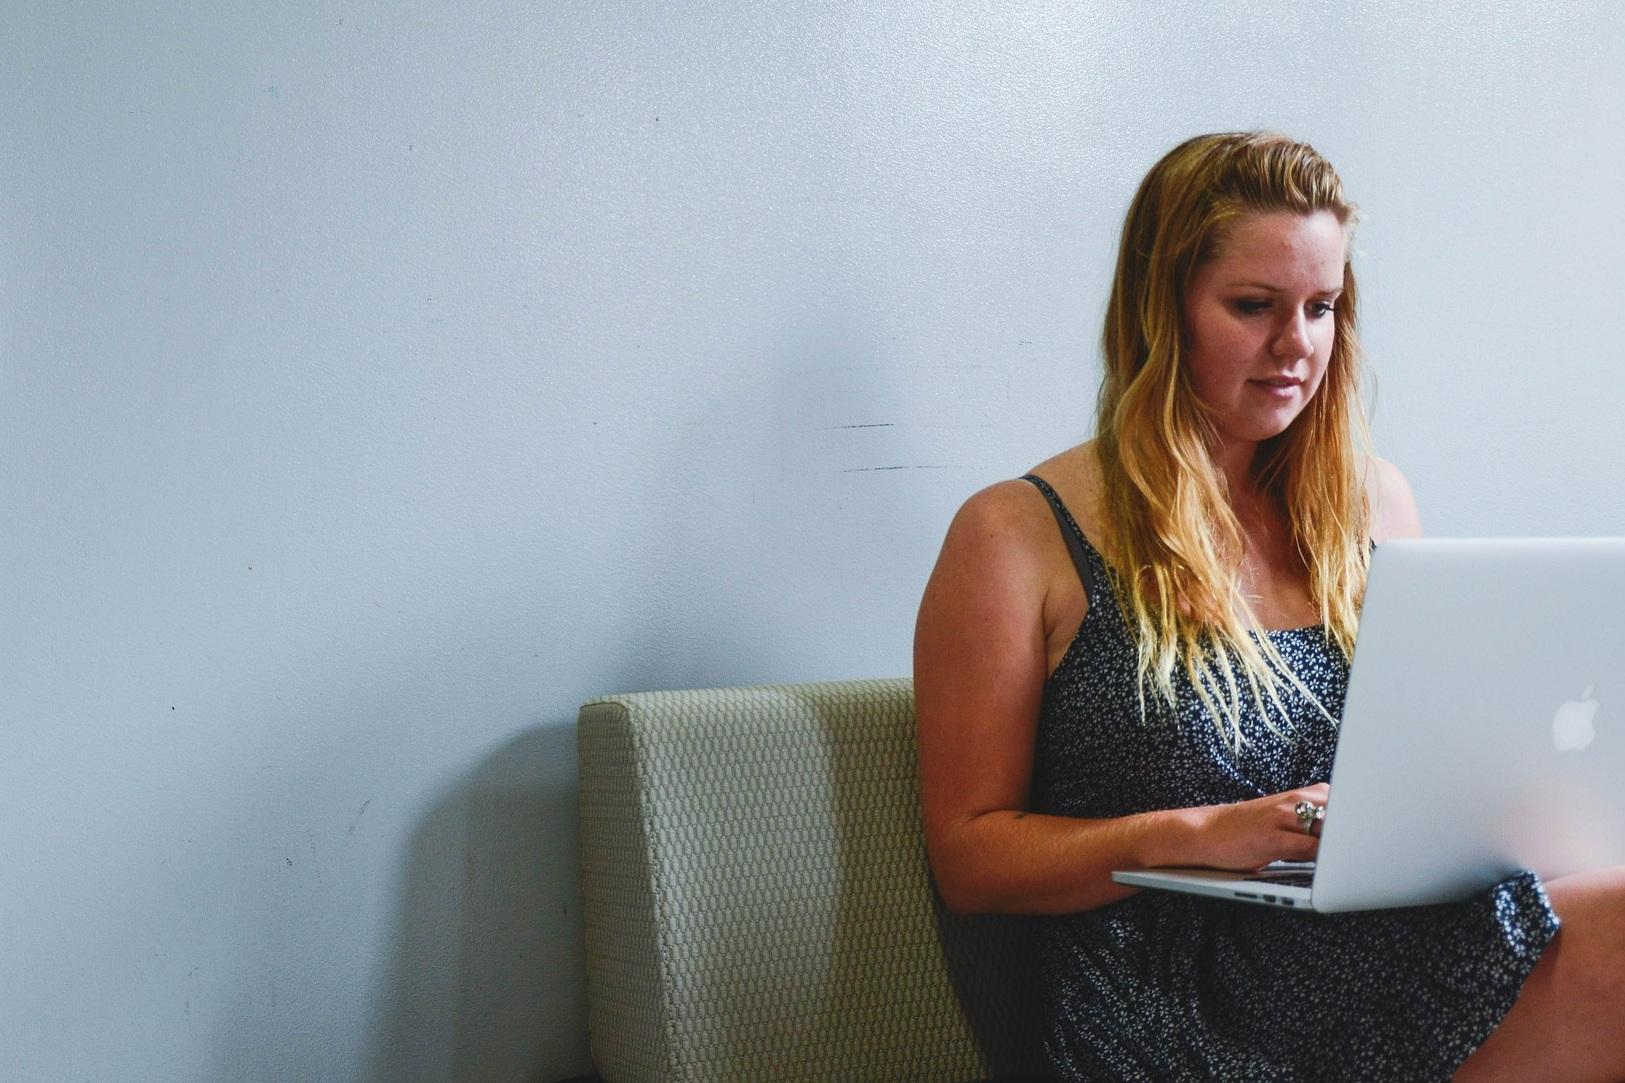 woman-entrepreneur-on-laptop.jpg